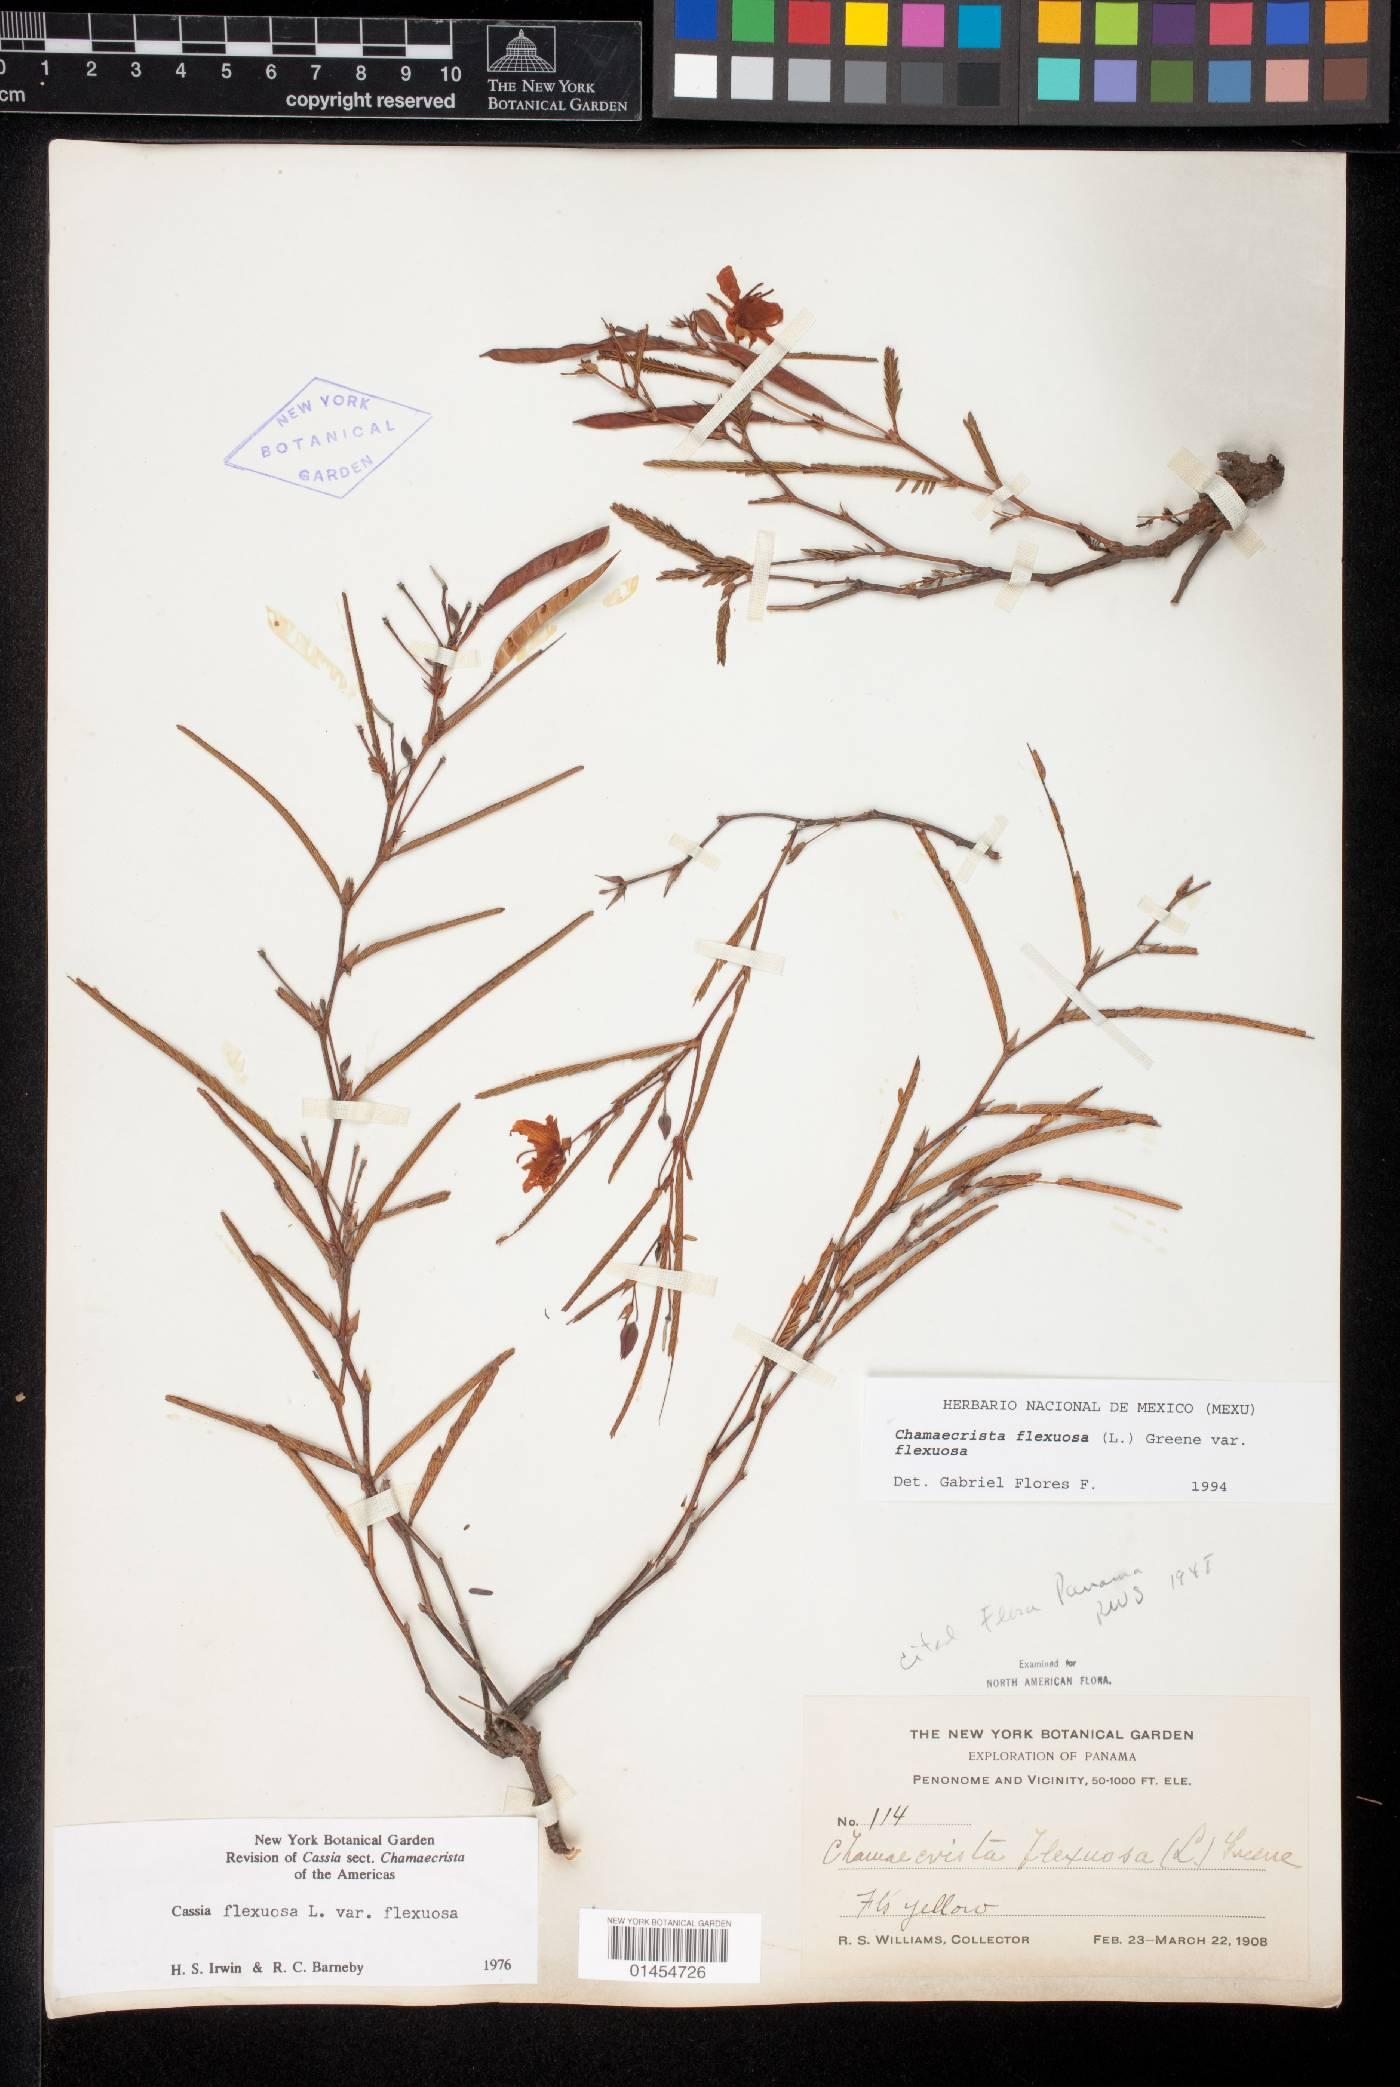 Chamaecrista flexuosa image